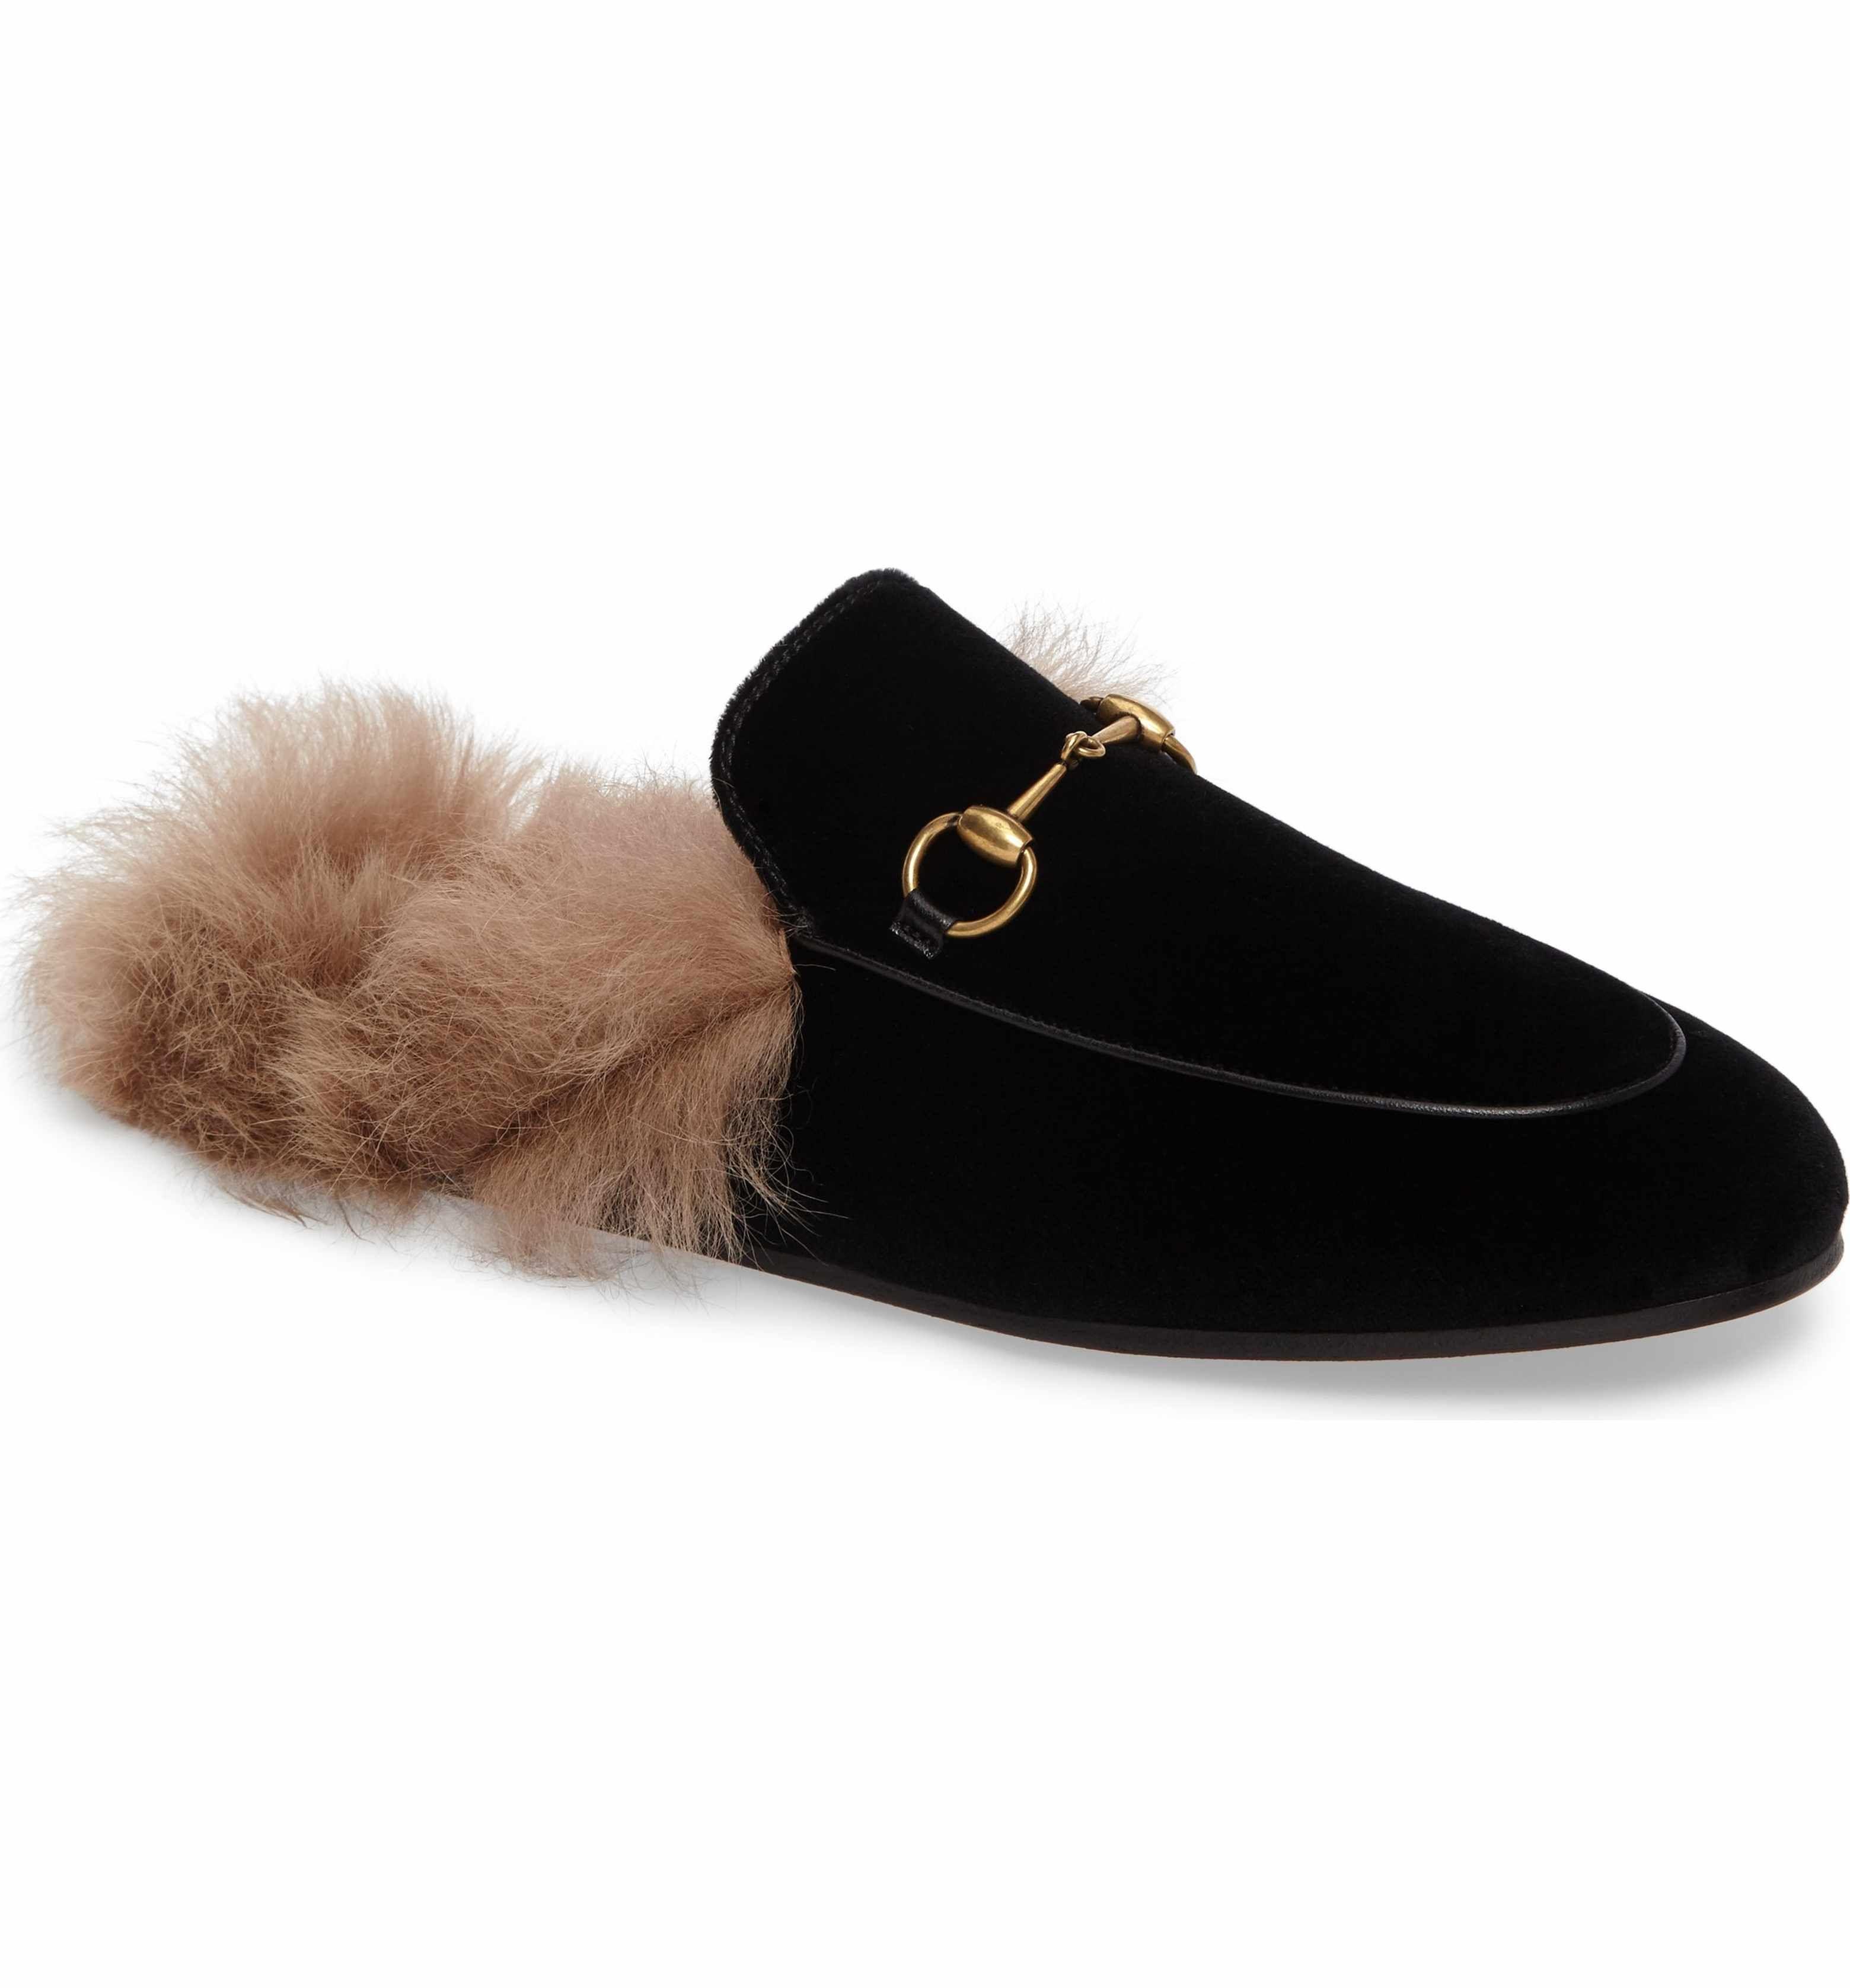 dcf9170d41e Gucci  Princetown  Genuine Shearling Mule Loafer - black velvet (Women)